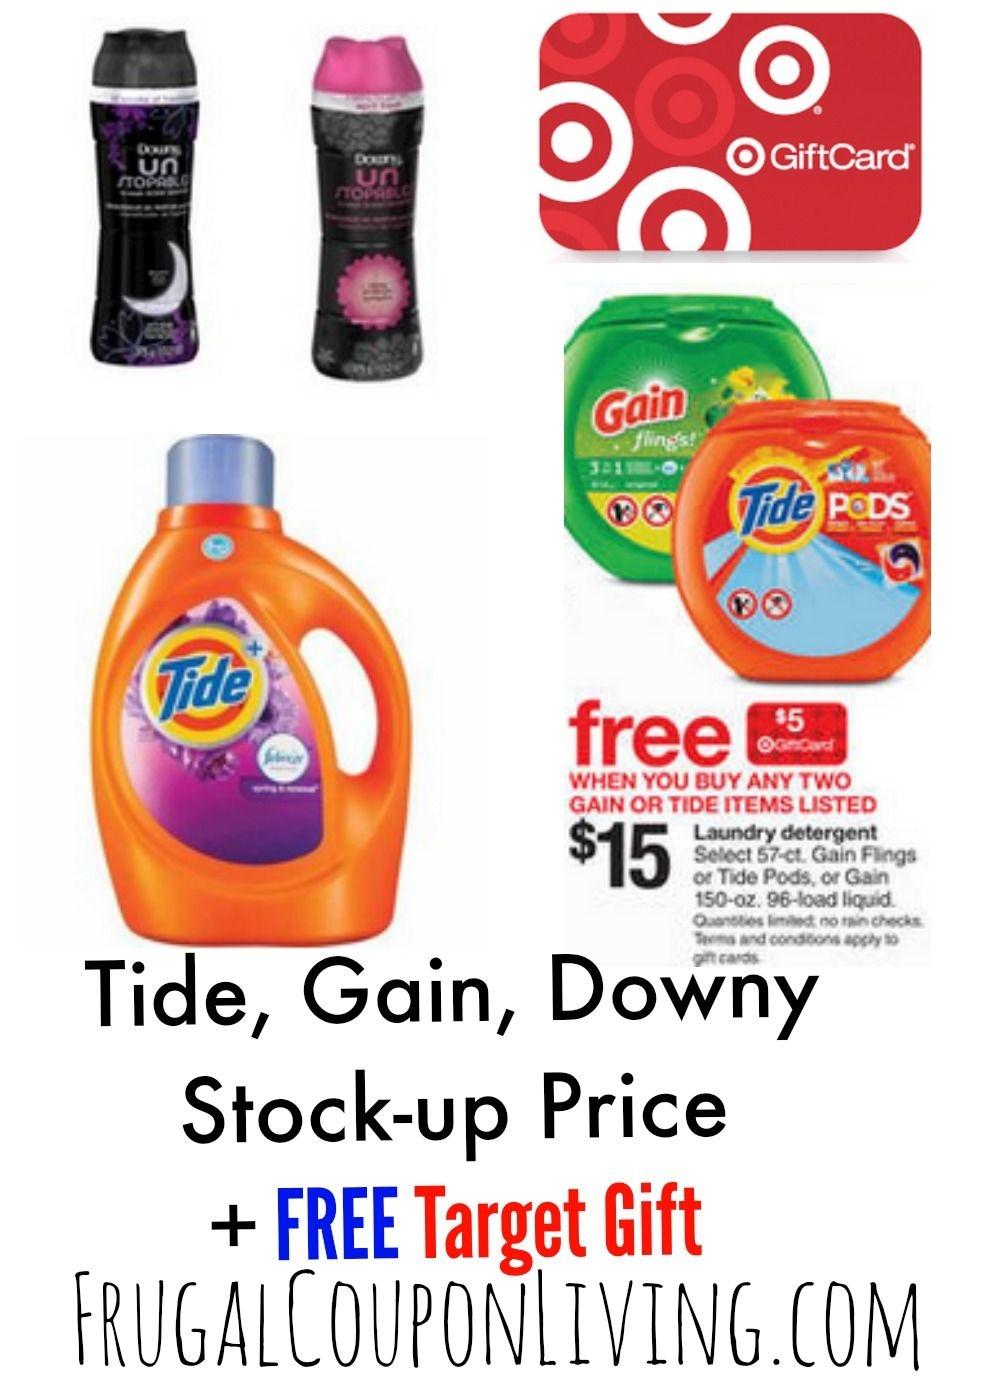 Target Laundry Detergent Deals + Tide & Downy Printable Coupons - Tide Coupons Free Printable